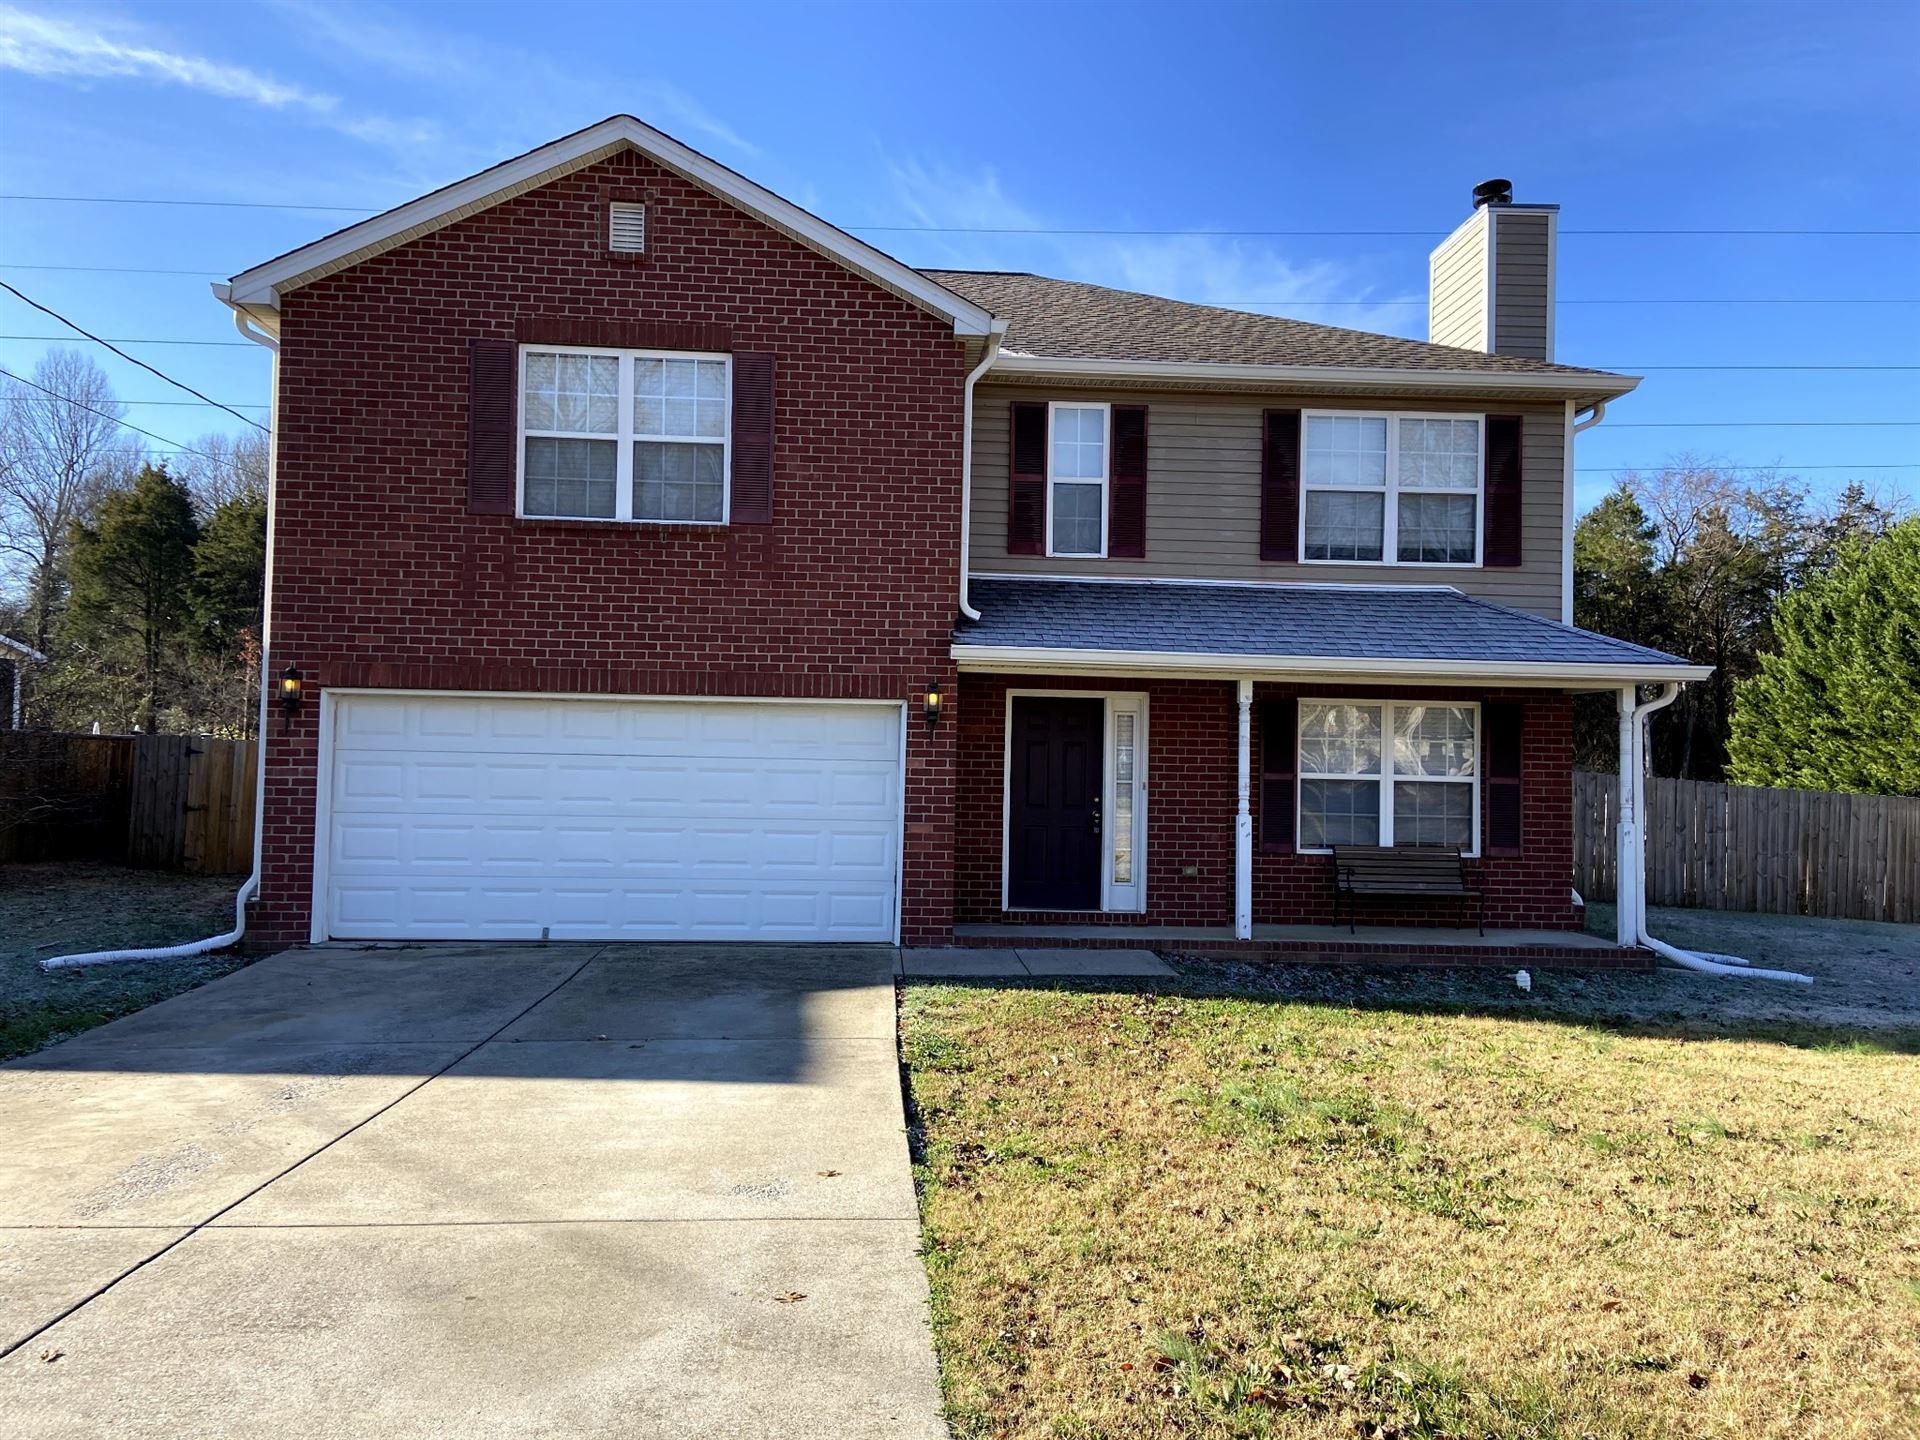 114 Arkansas Ct, Murfreesboro, TN 37129 - MLS#: 2210810